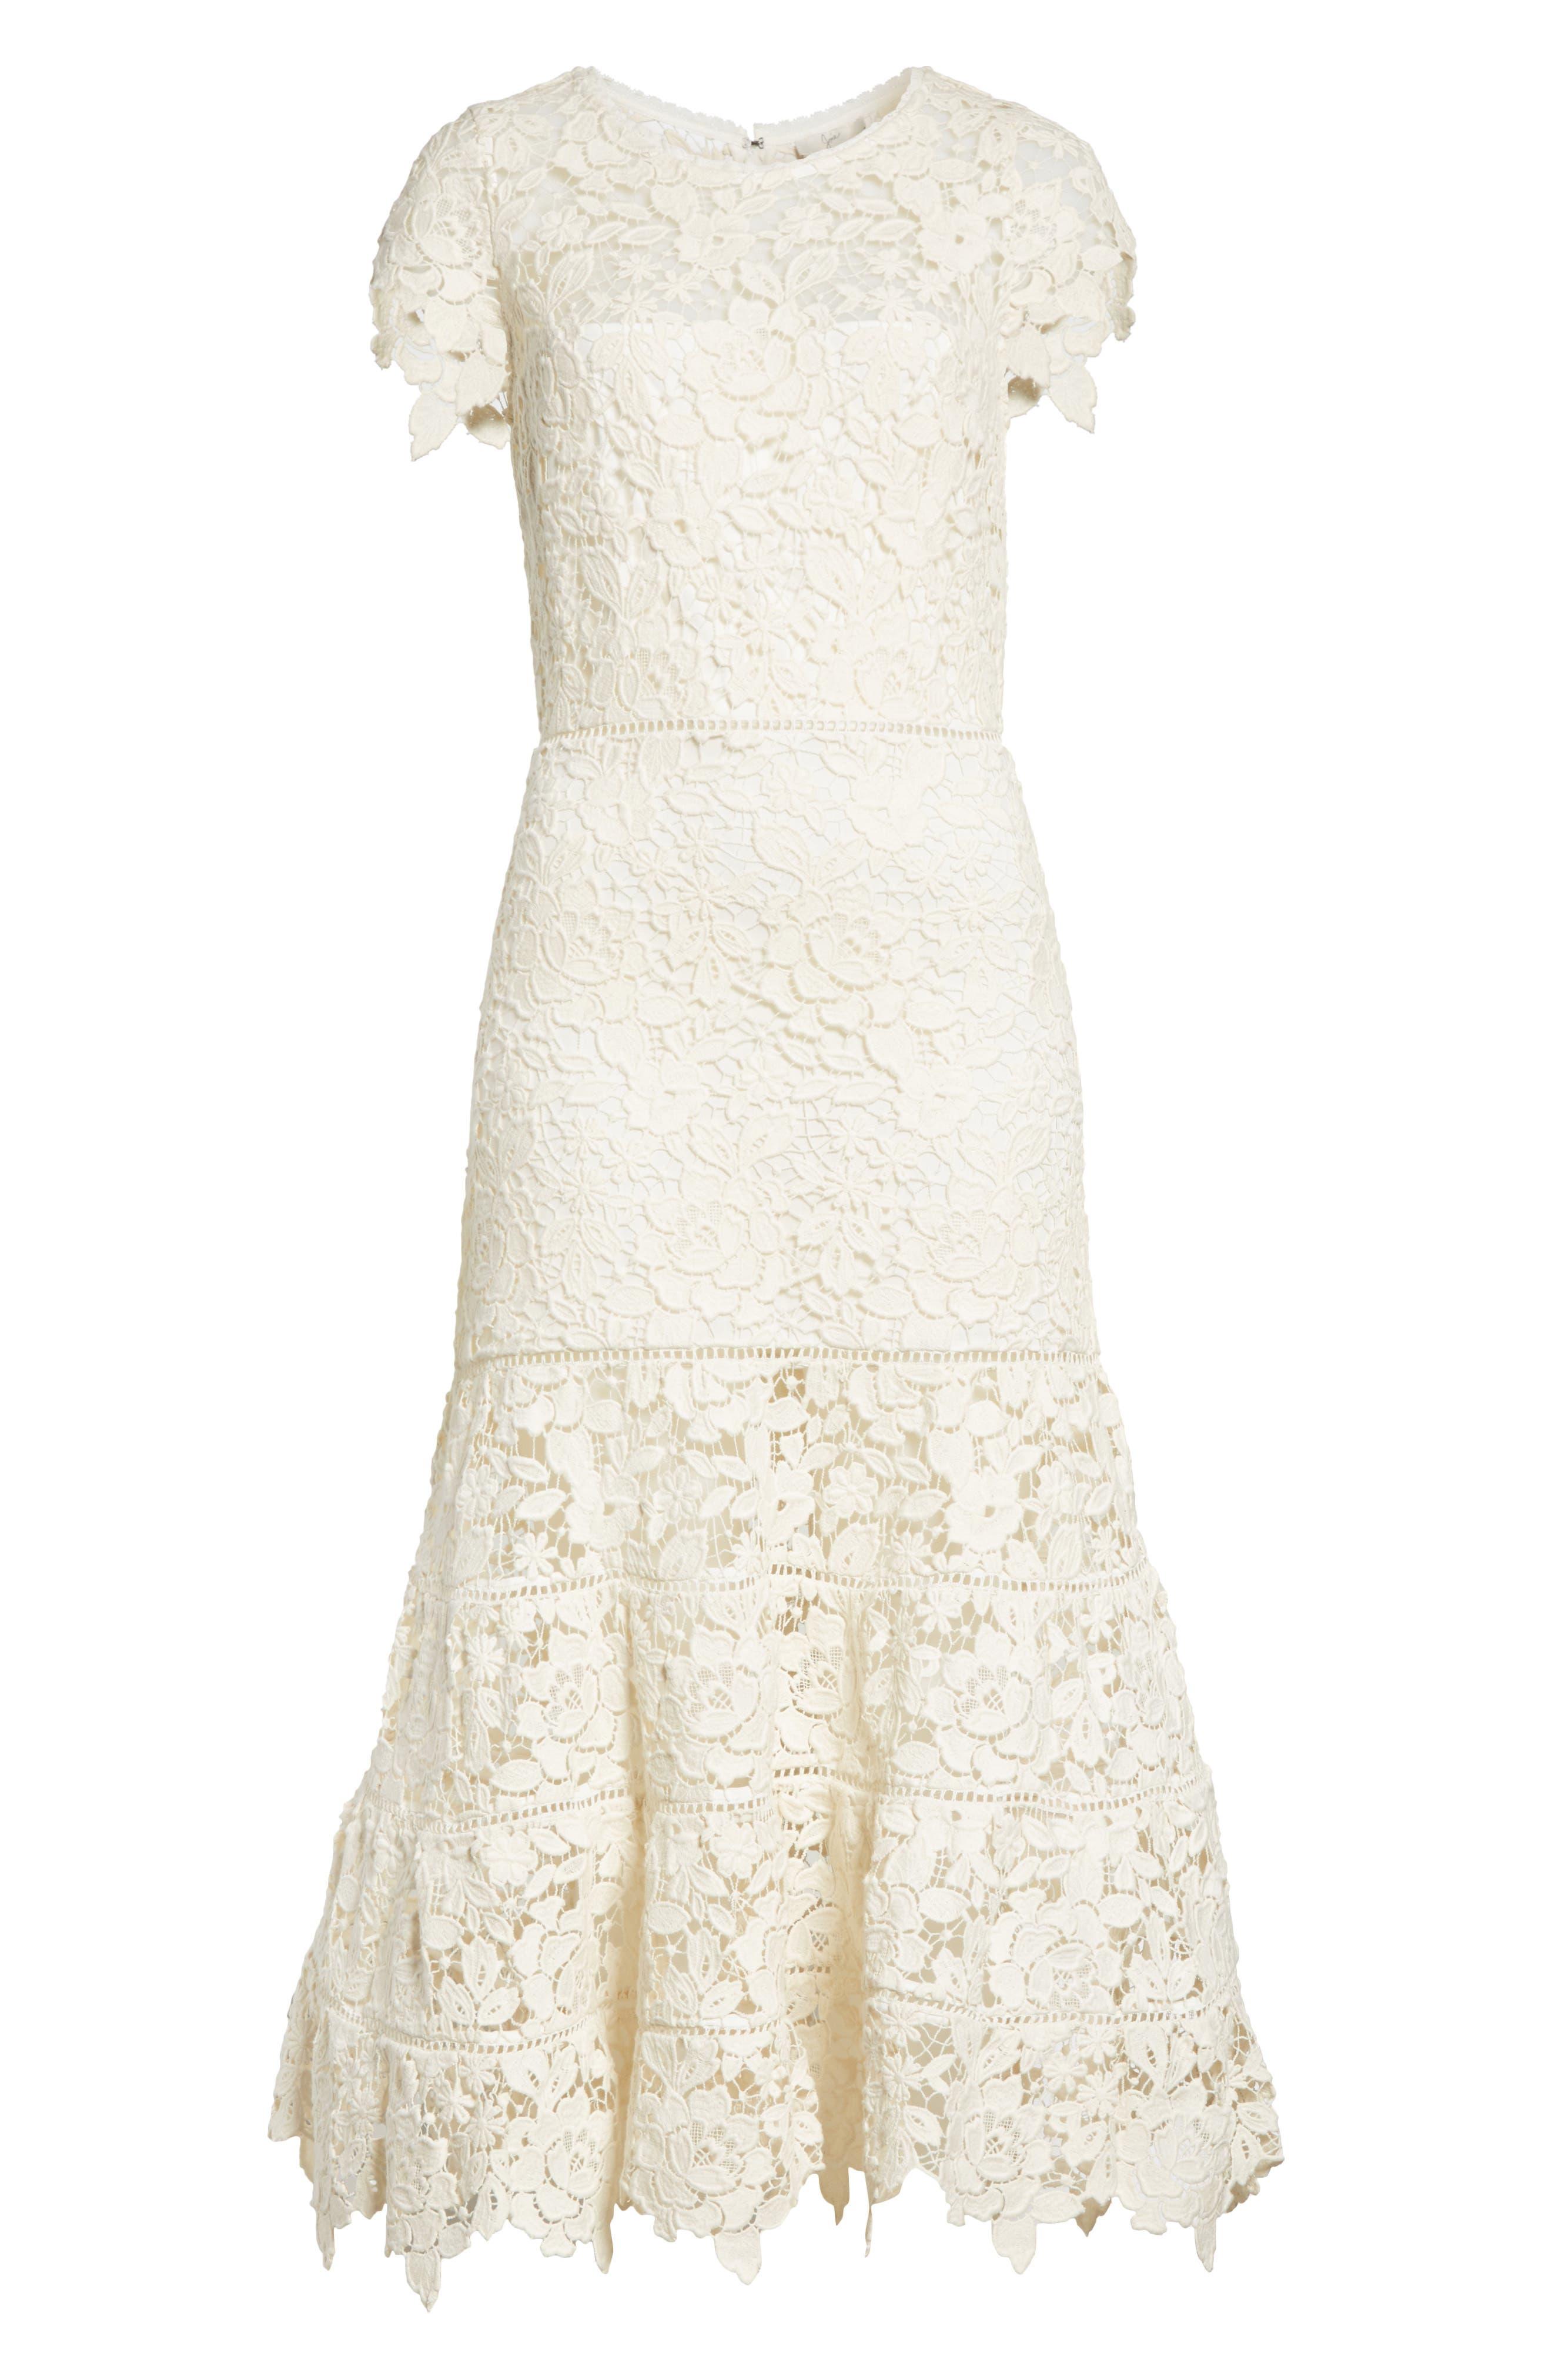 Celedonia Scallop Lace Dress,                             Alternate thumbnail 6, color,                             120